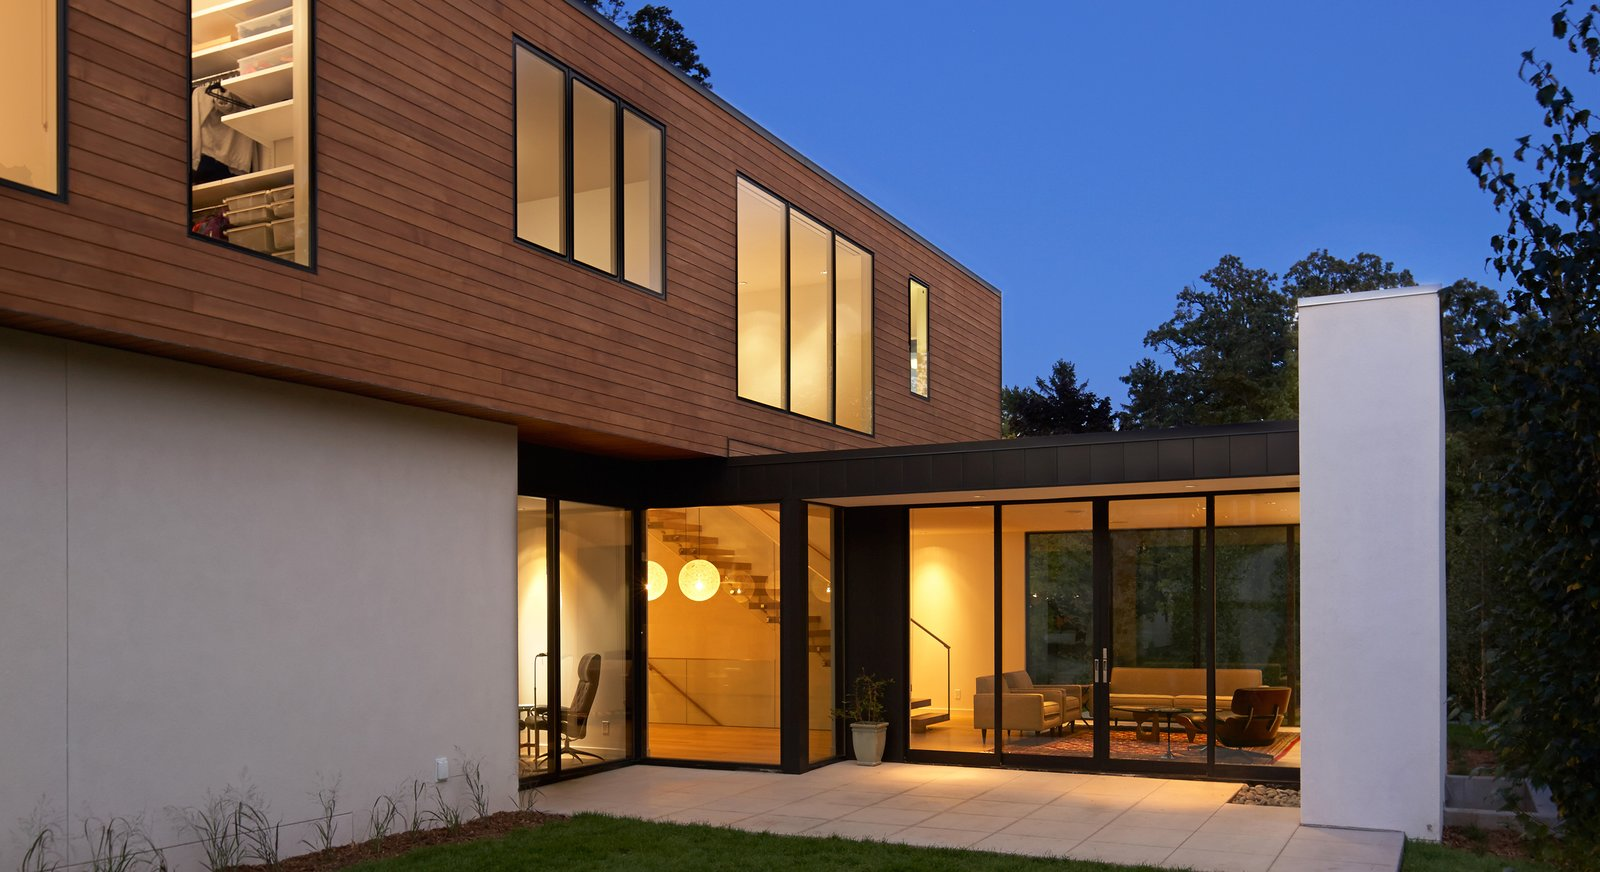 Sheridan Residence by Peterssen/Keller Architecture